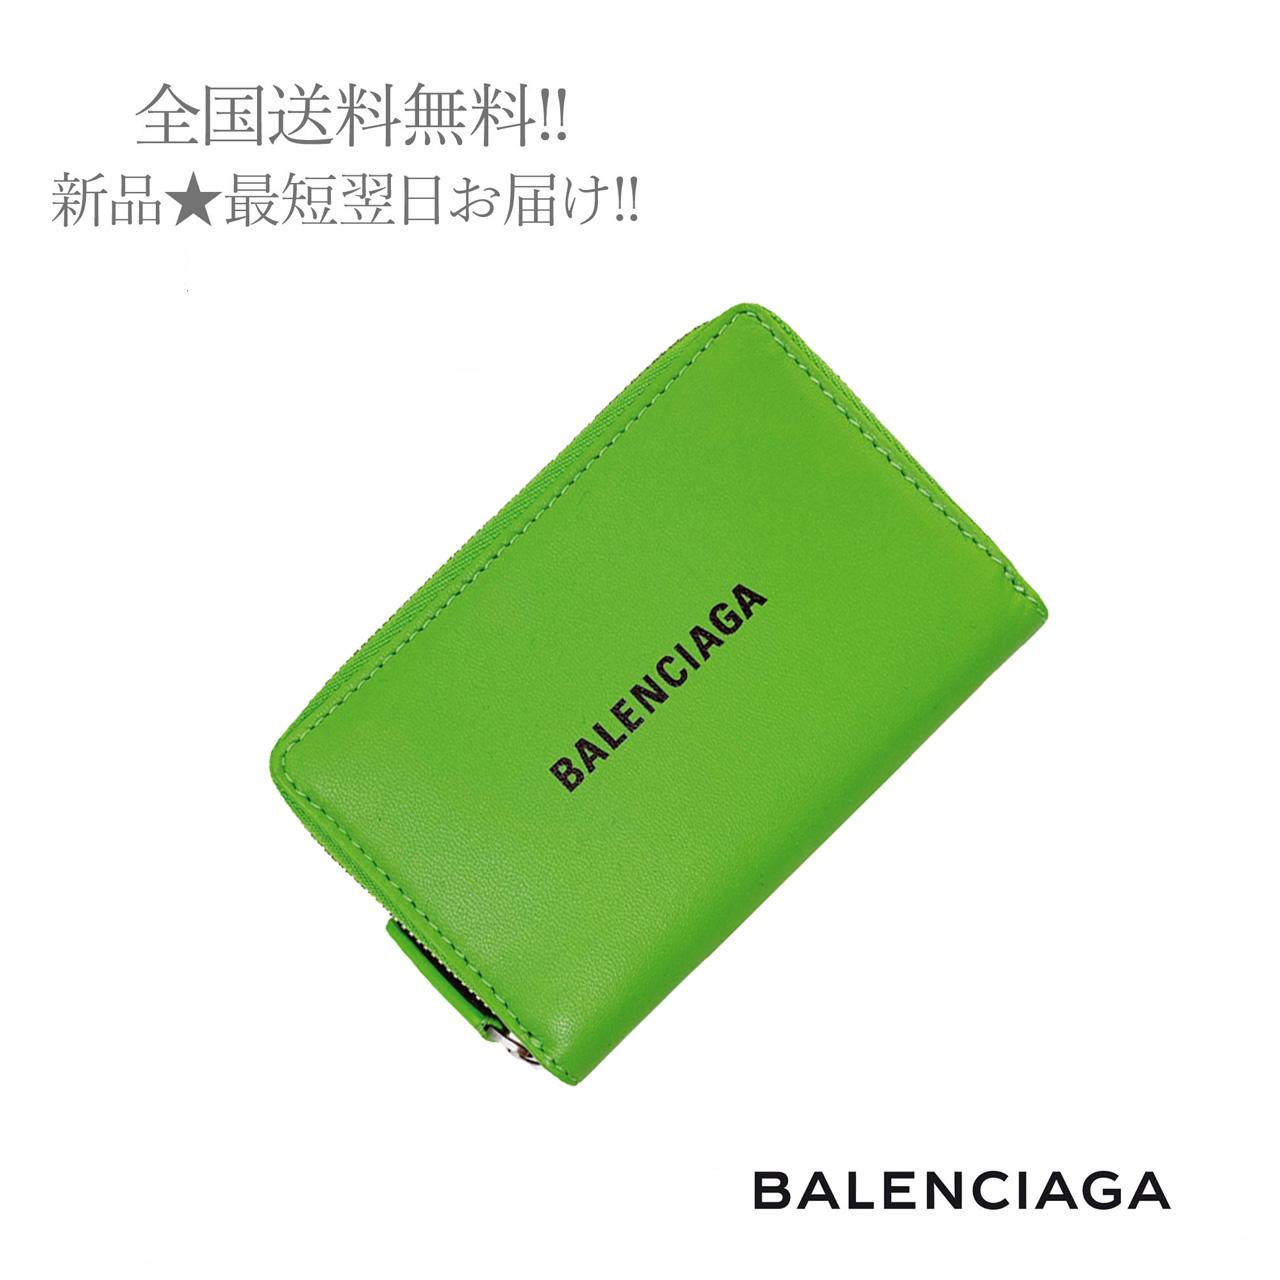 BALENCIAGA バレンシアガ カードケース 財布 ミニウォレット ロゴ メンズ 男 新品 ライトグリーン 超安い 3860 イタリア製 お値打ち価格で